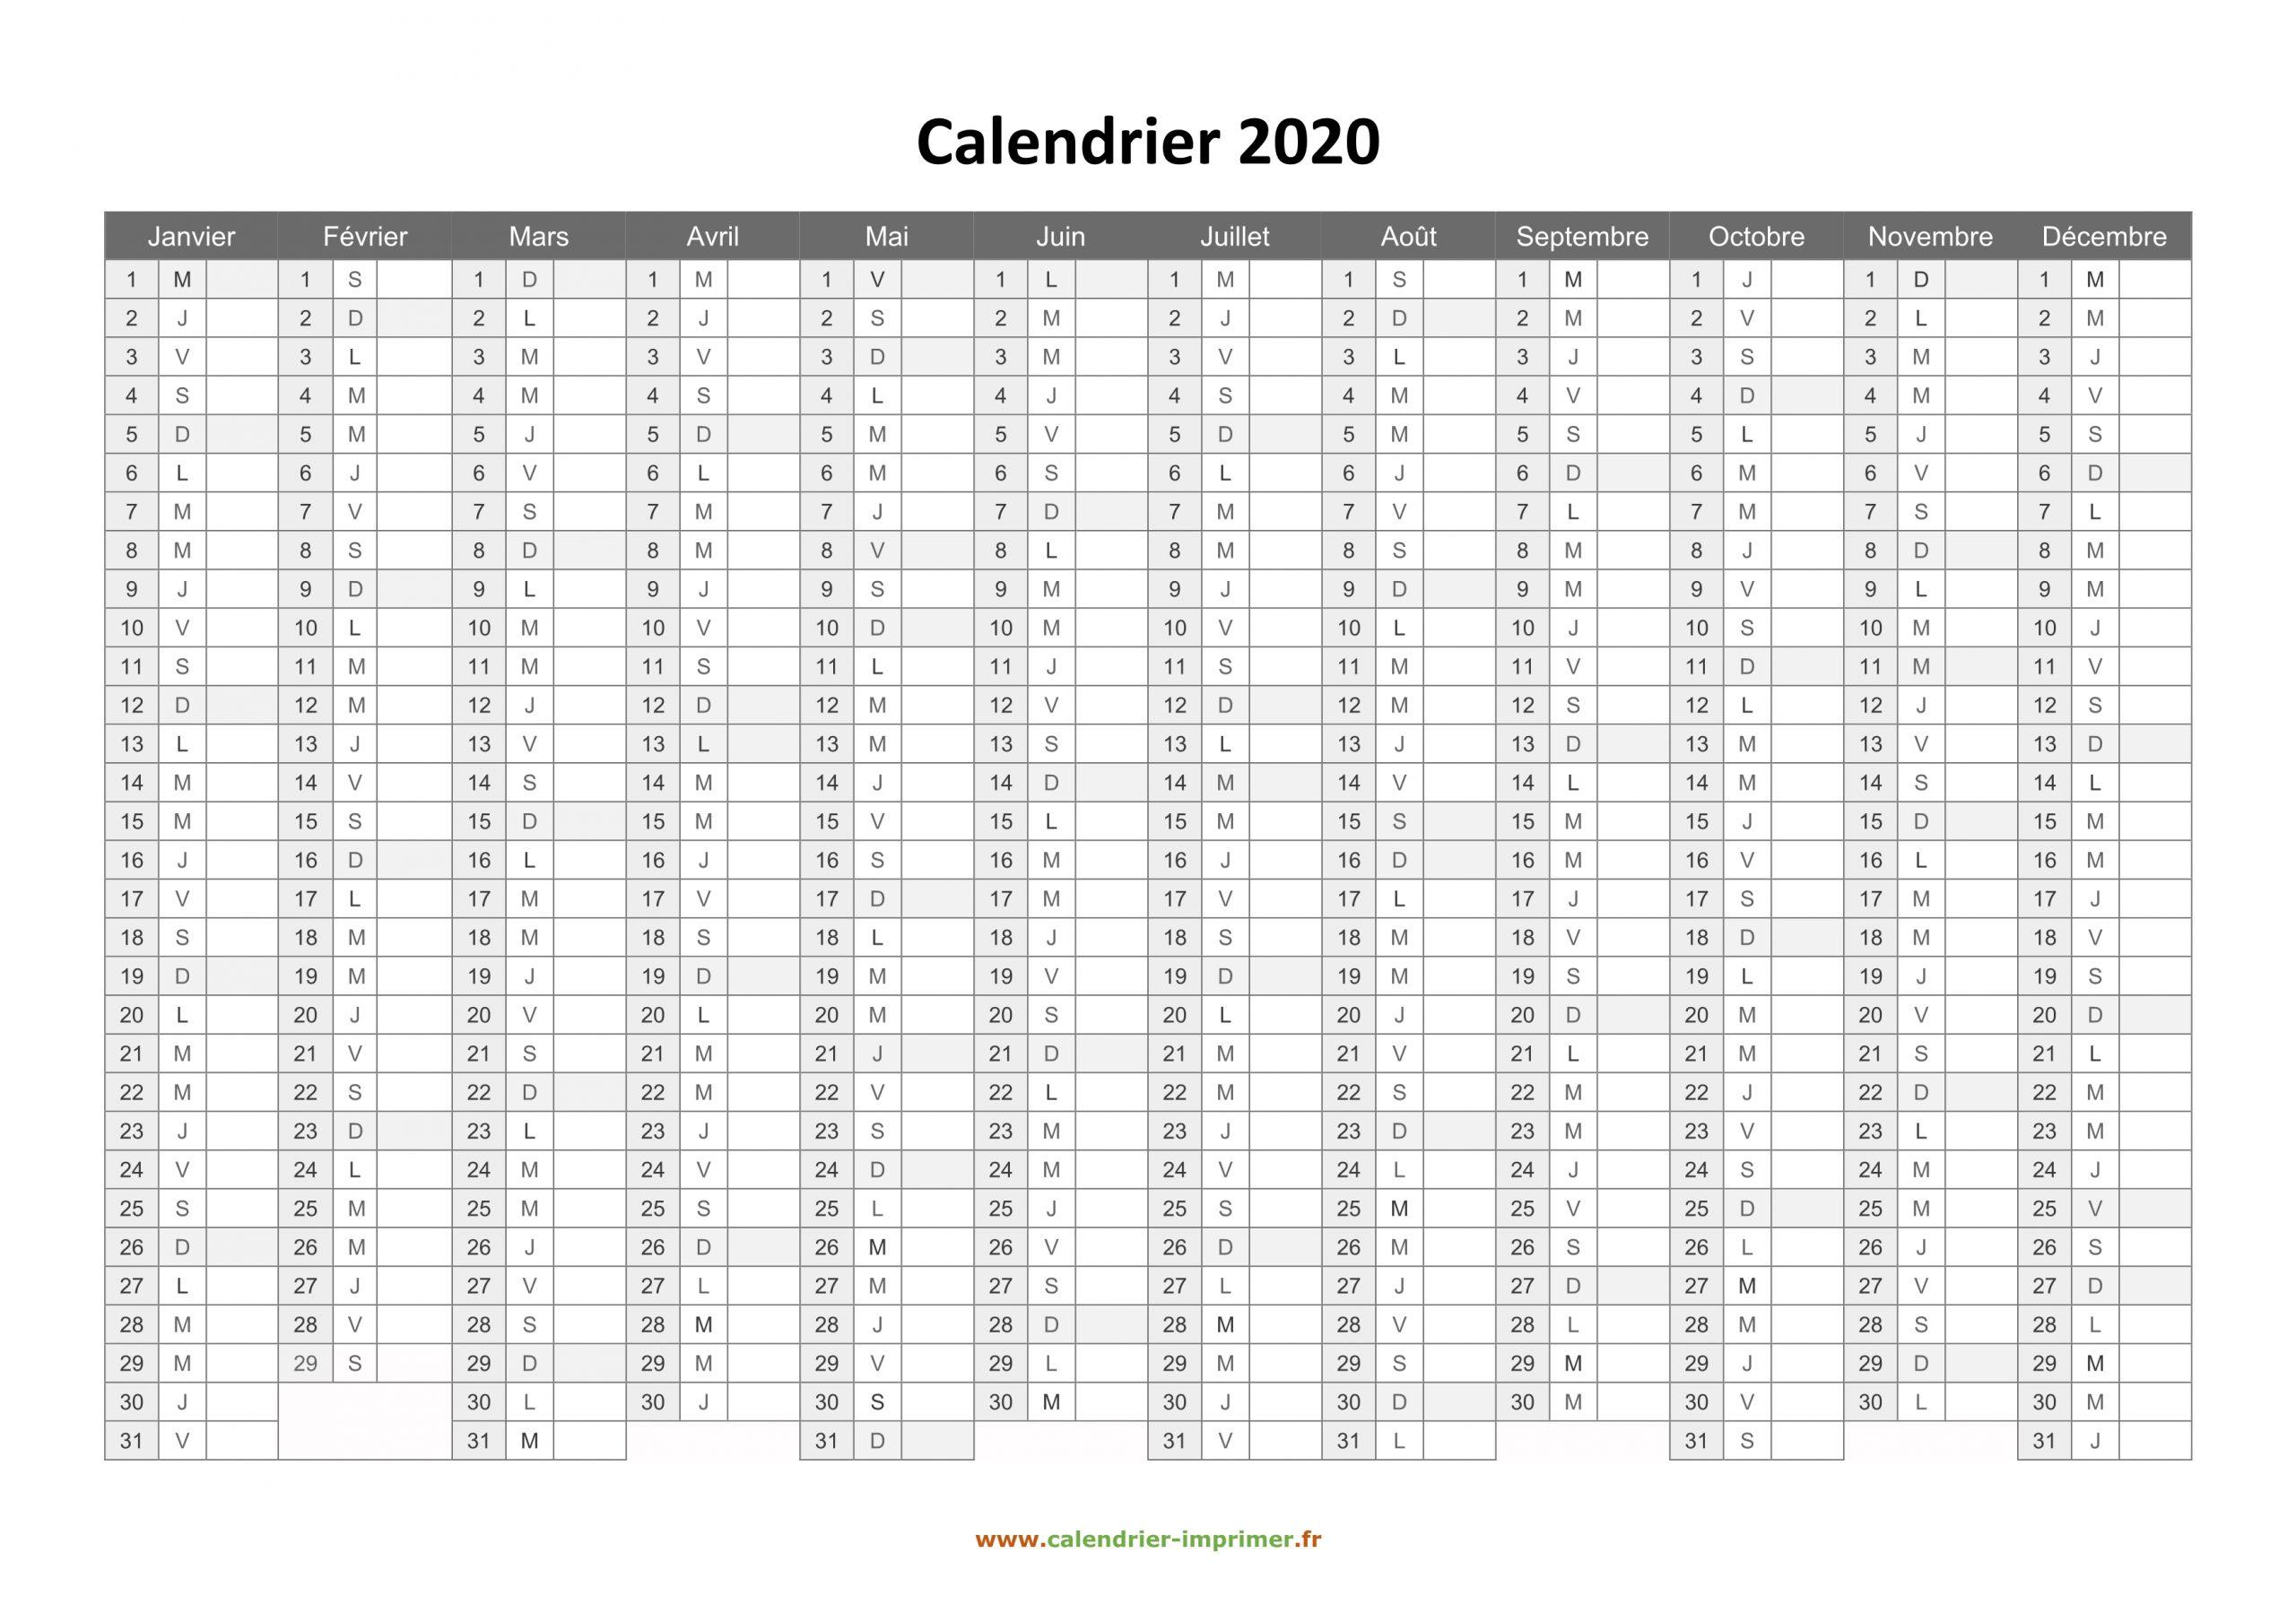 Calendrier 2020 À Imprimer Gratuit serapportantà Calendrier A Imprimer 2018